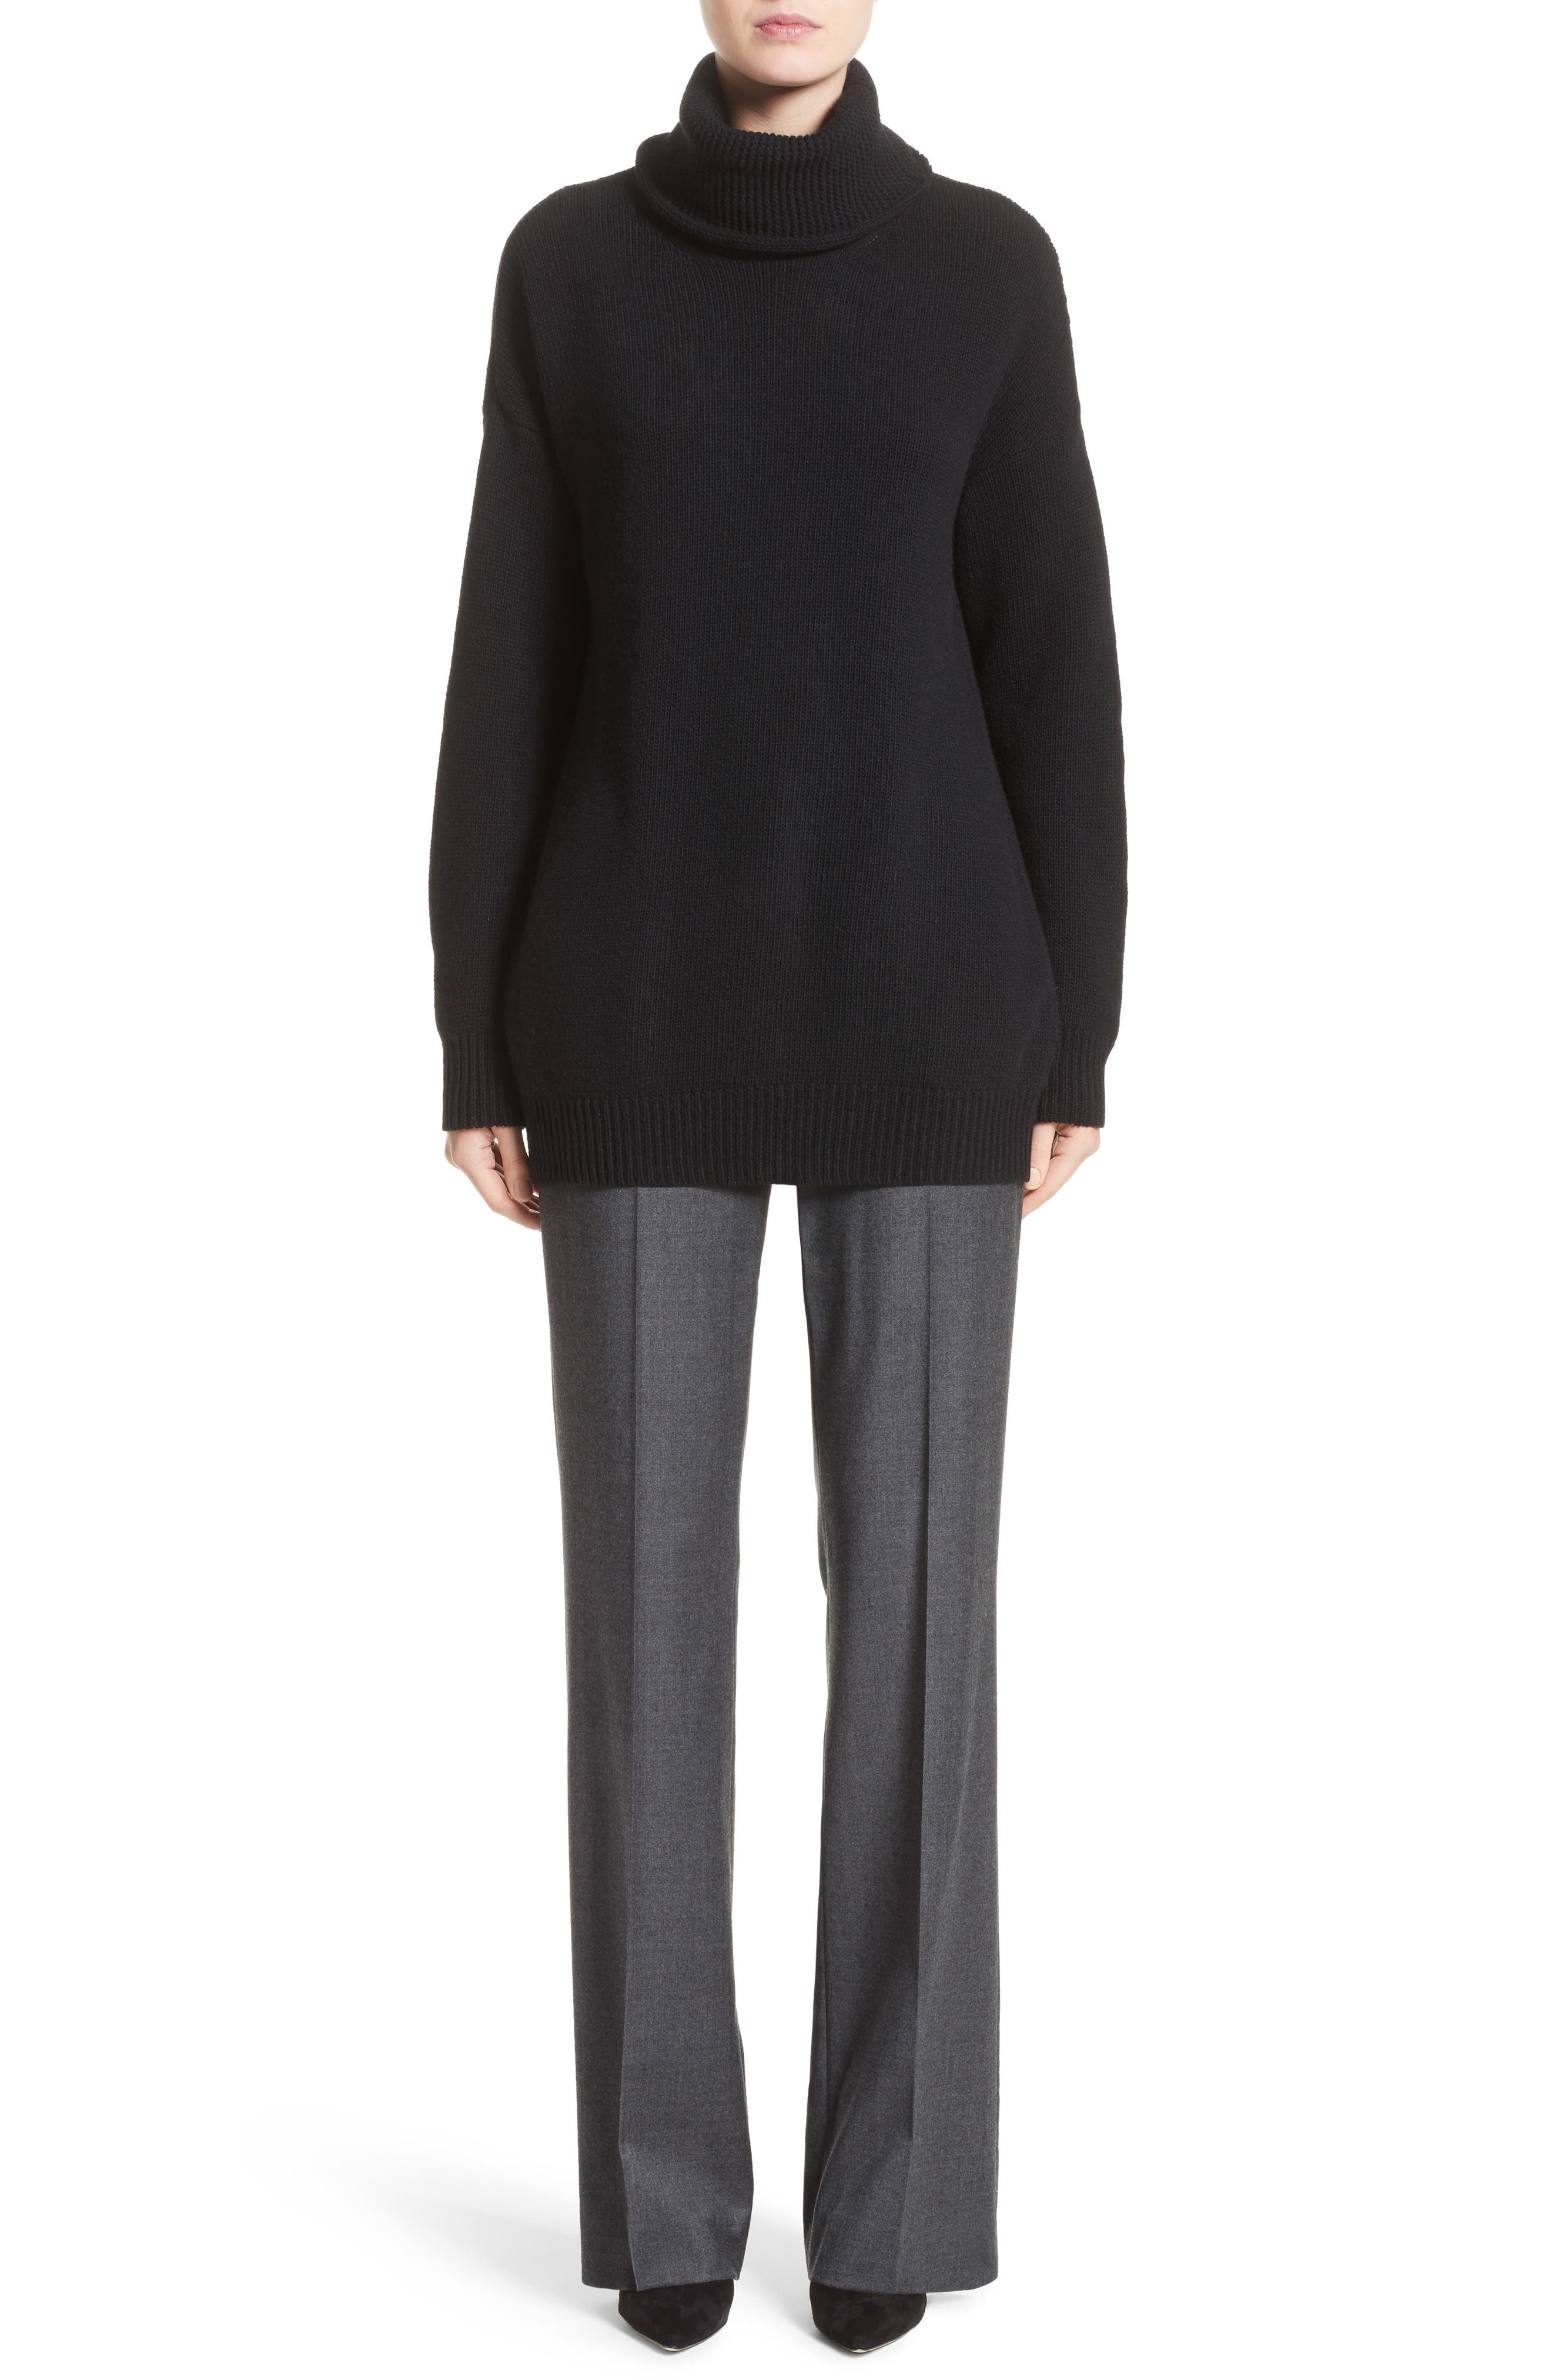 Pedone Wool Pants,                             Alternate thumbnail 10, color,                             Dark Grey